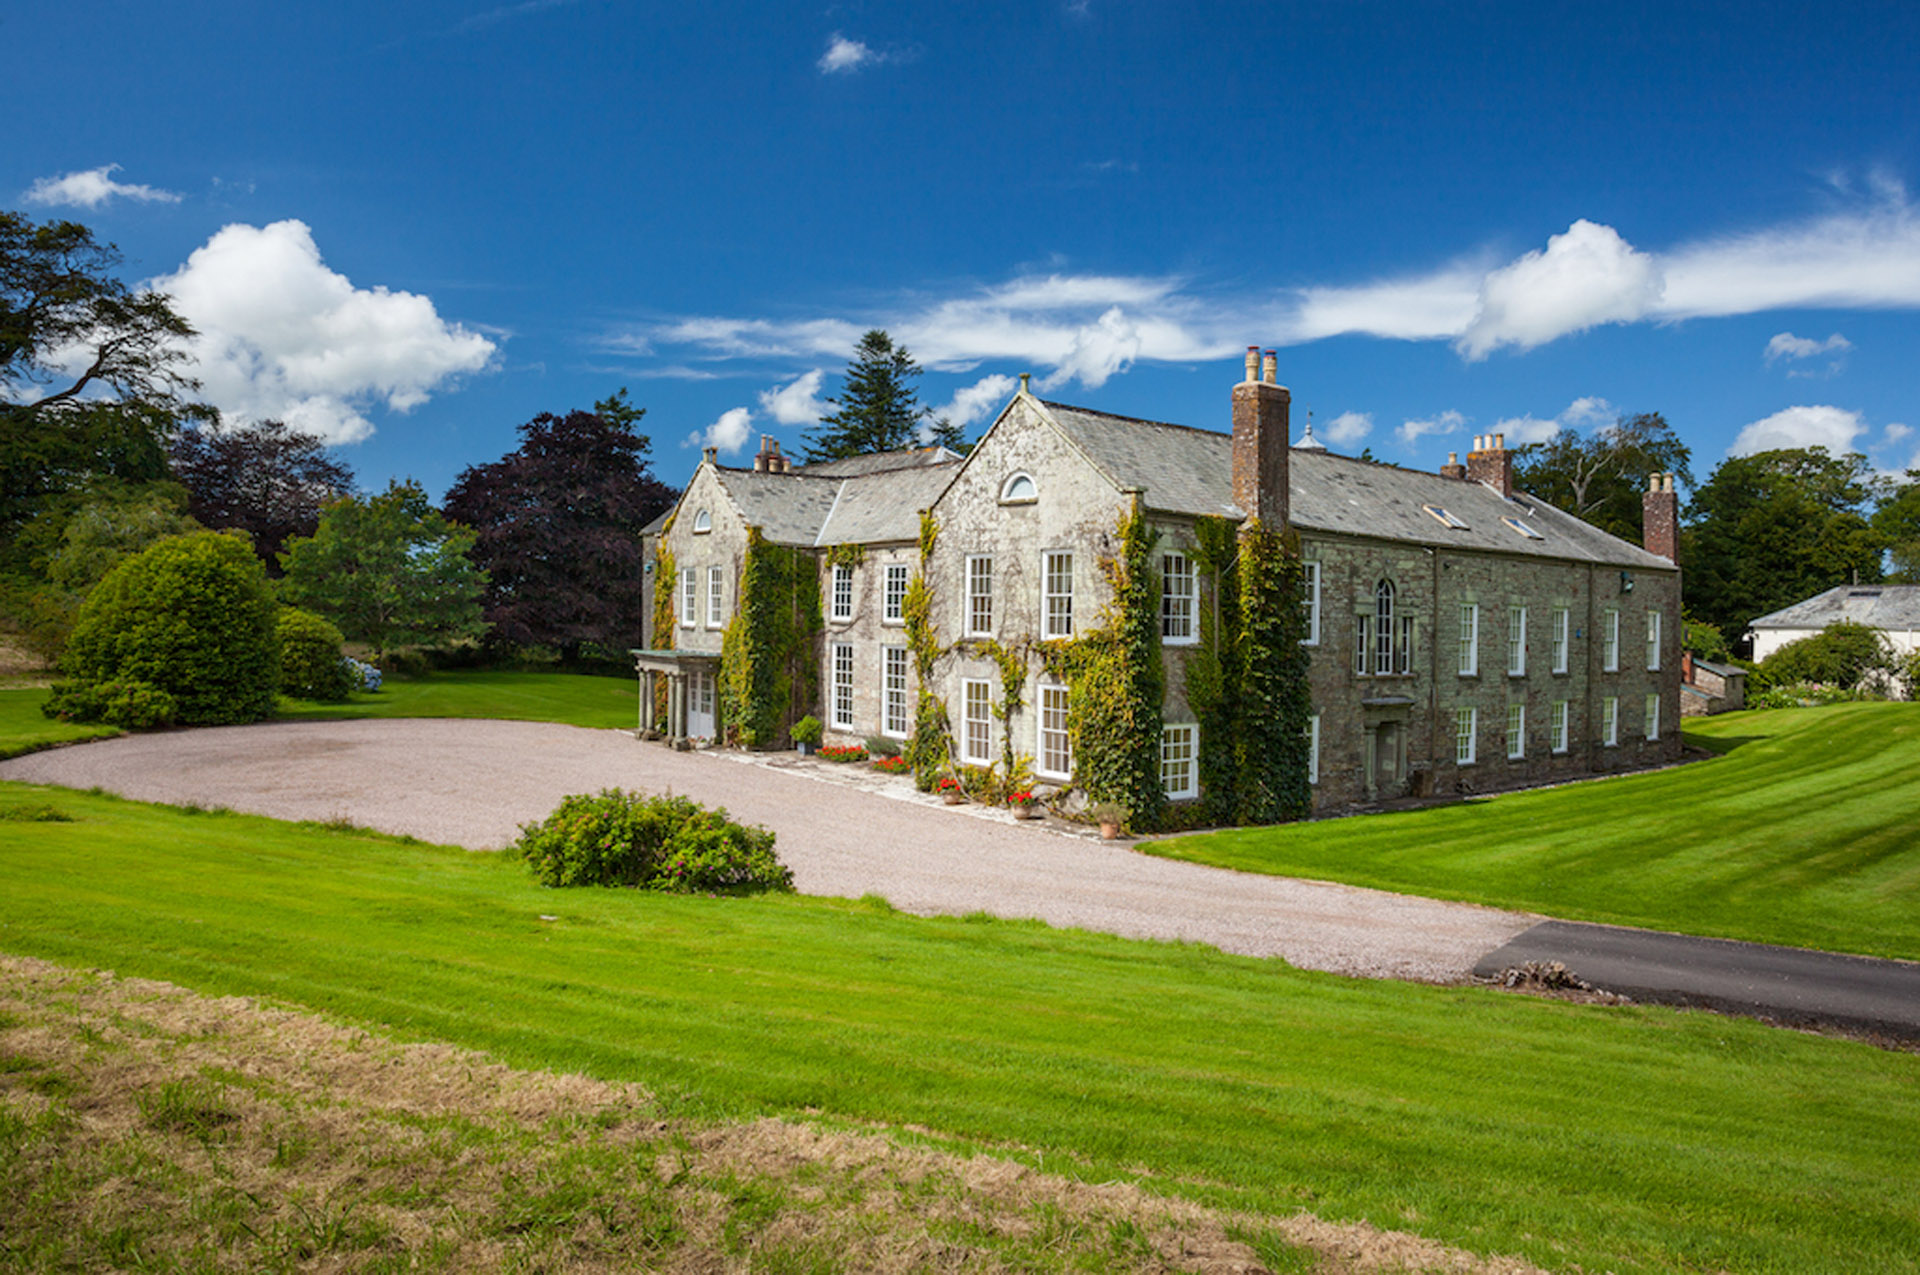 The Devon Manor House